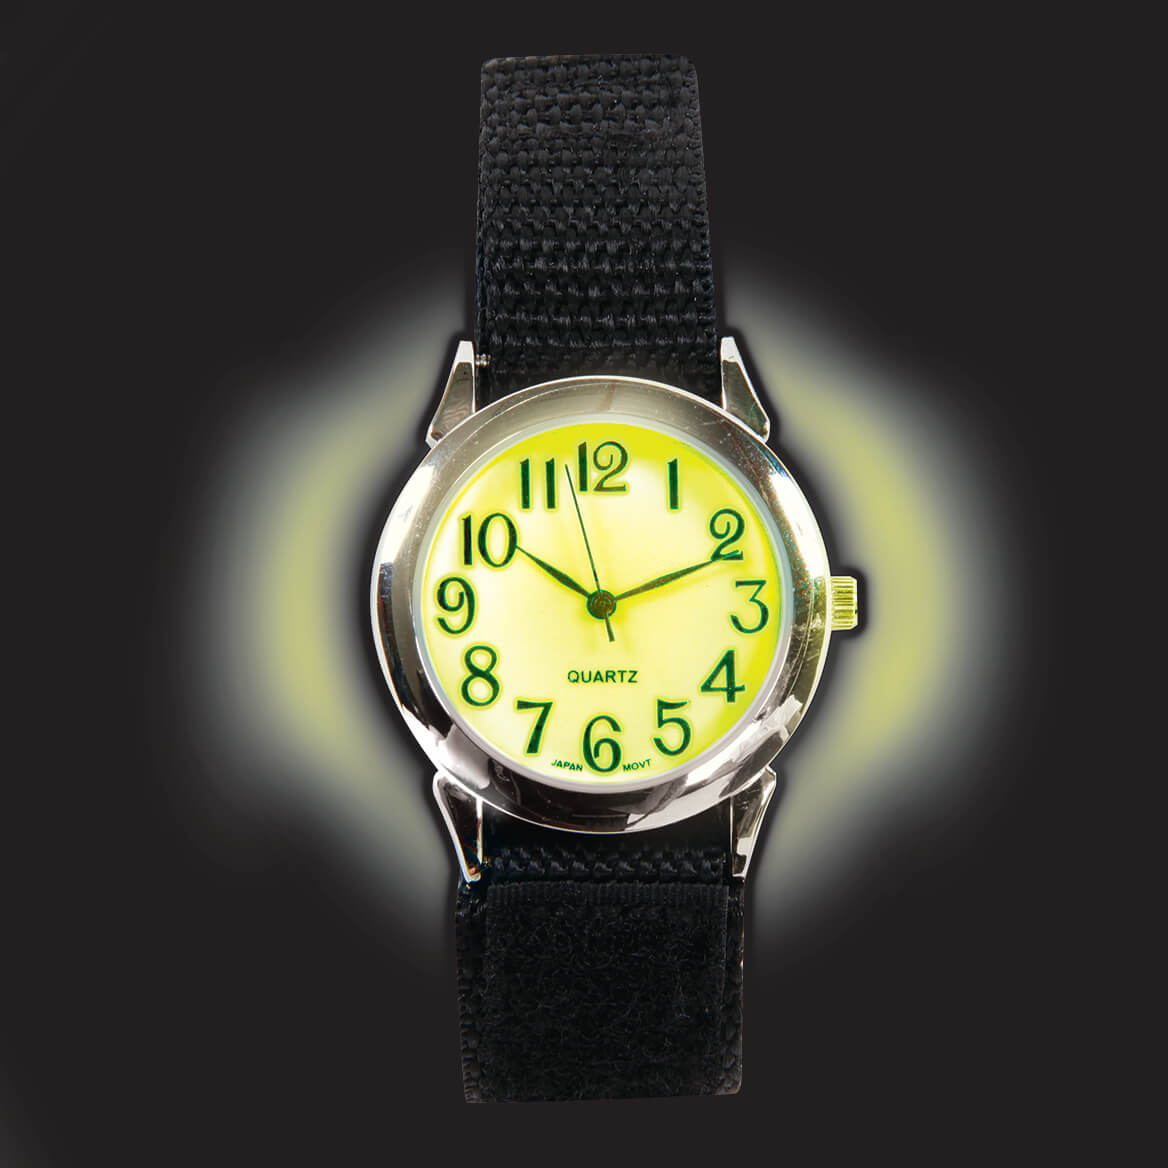 Glow in the Dark Watch-367962